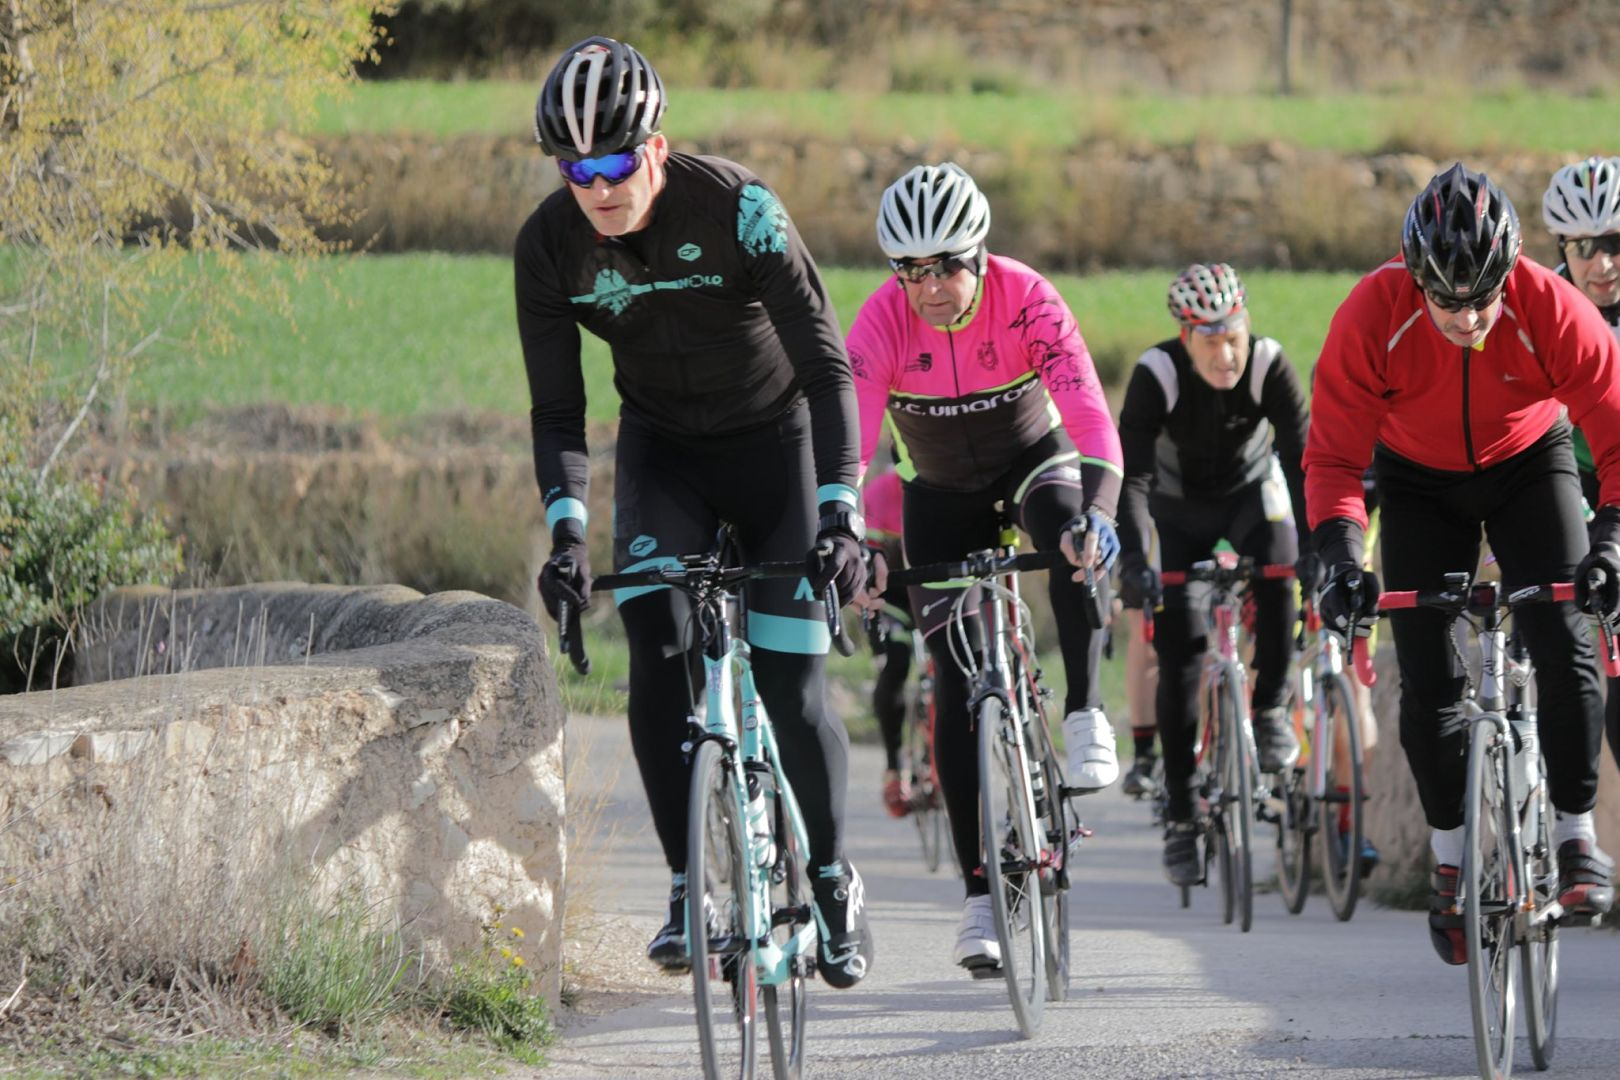 SLIDER_viajes_bici_maestrat_stage_peñiscola_ciclismo_carretera_feria_romana_octubre5